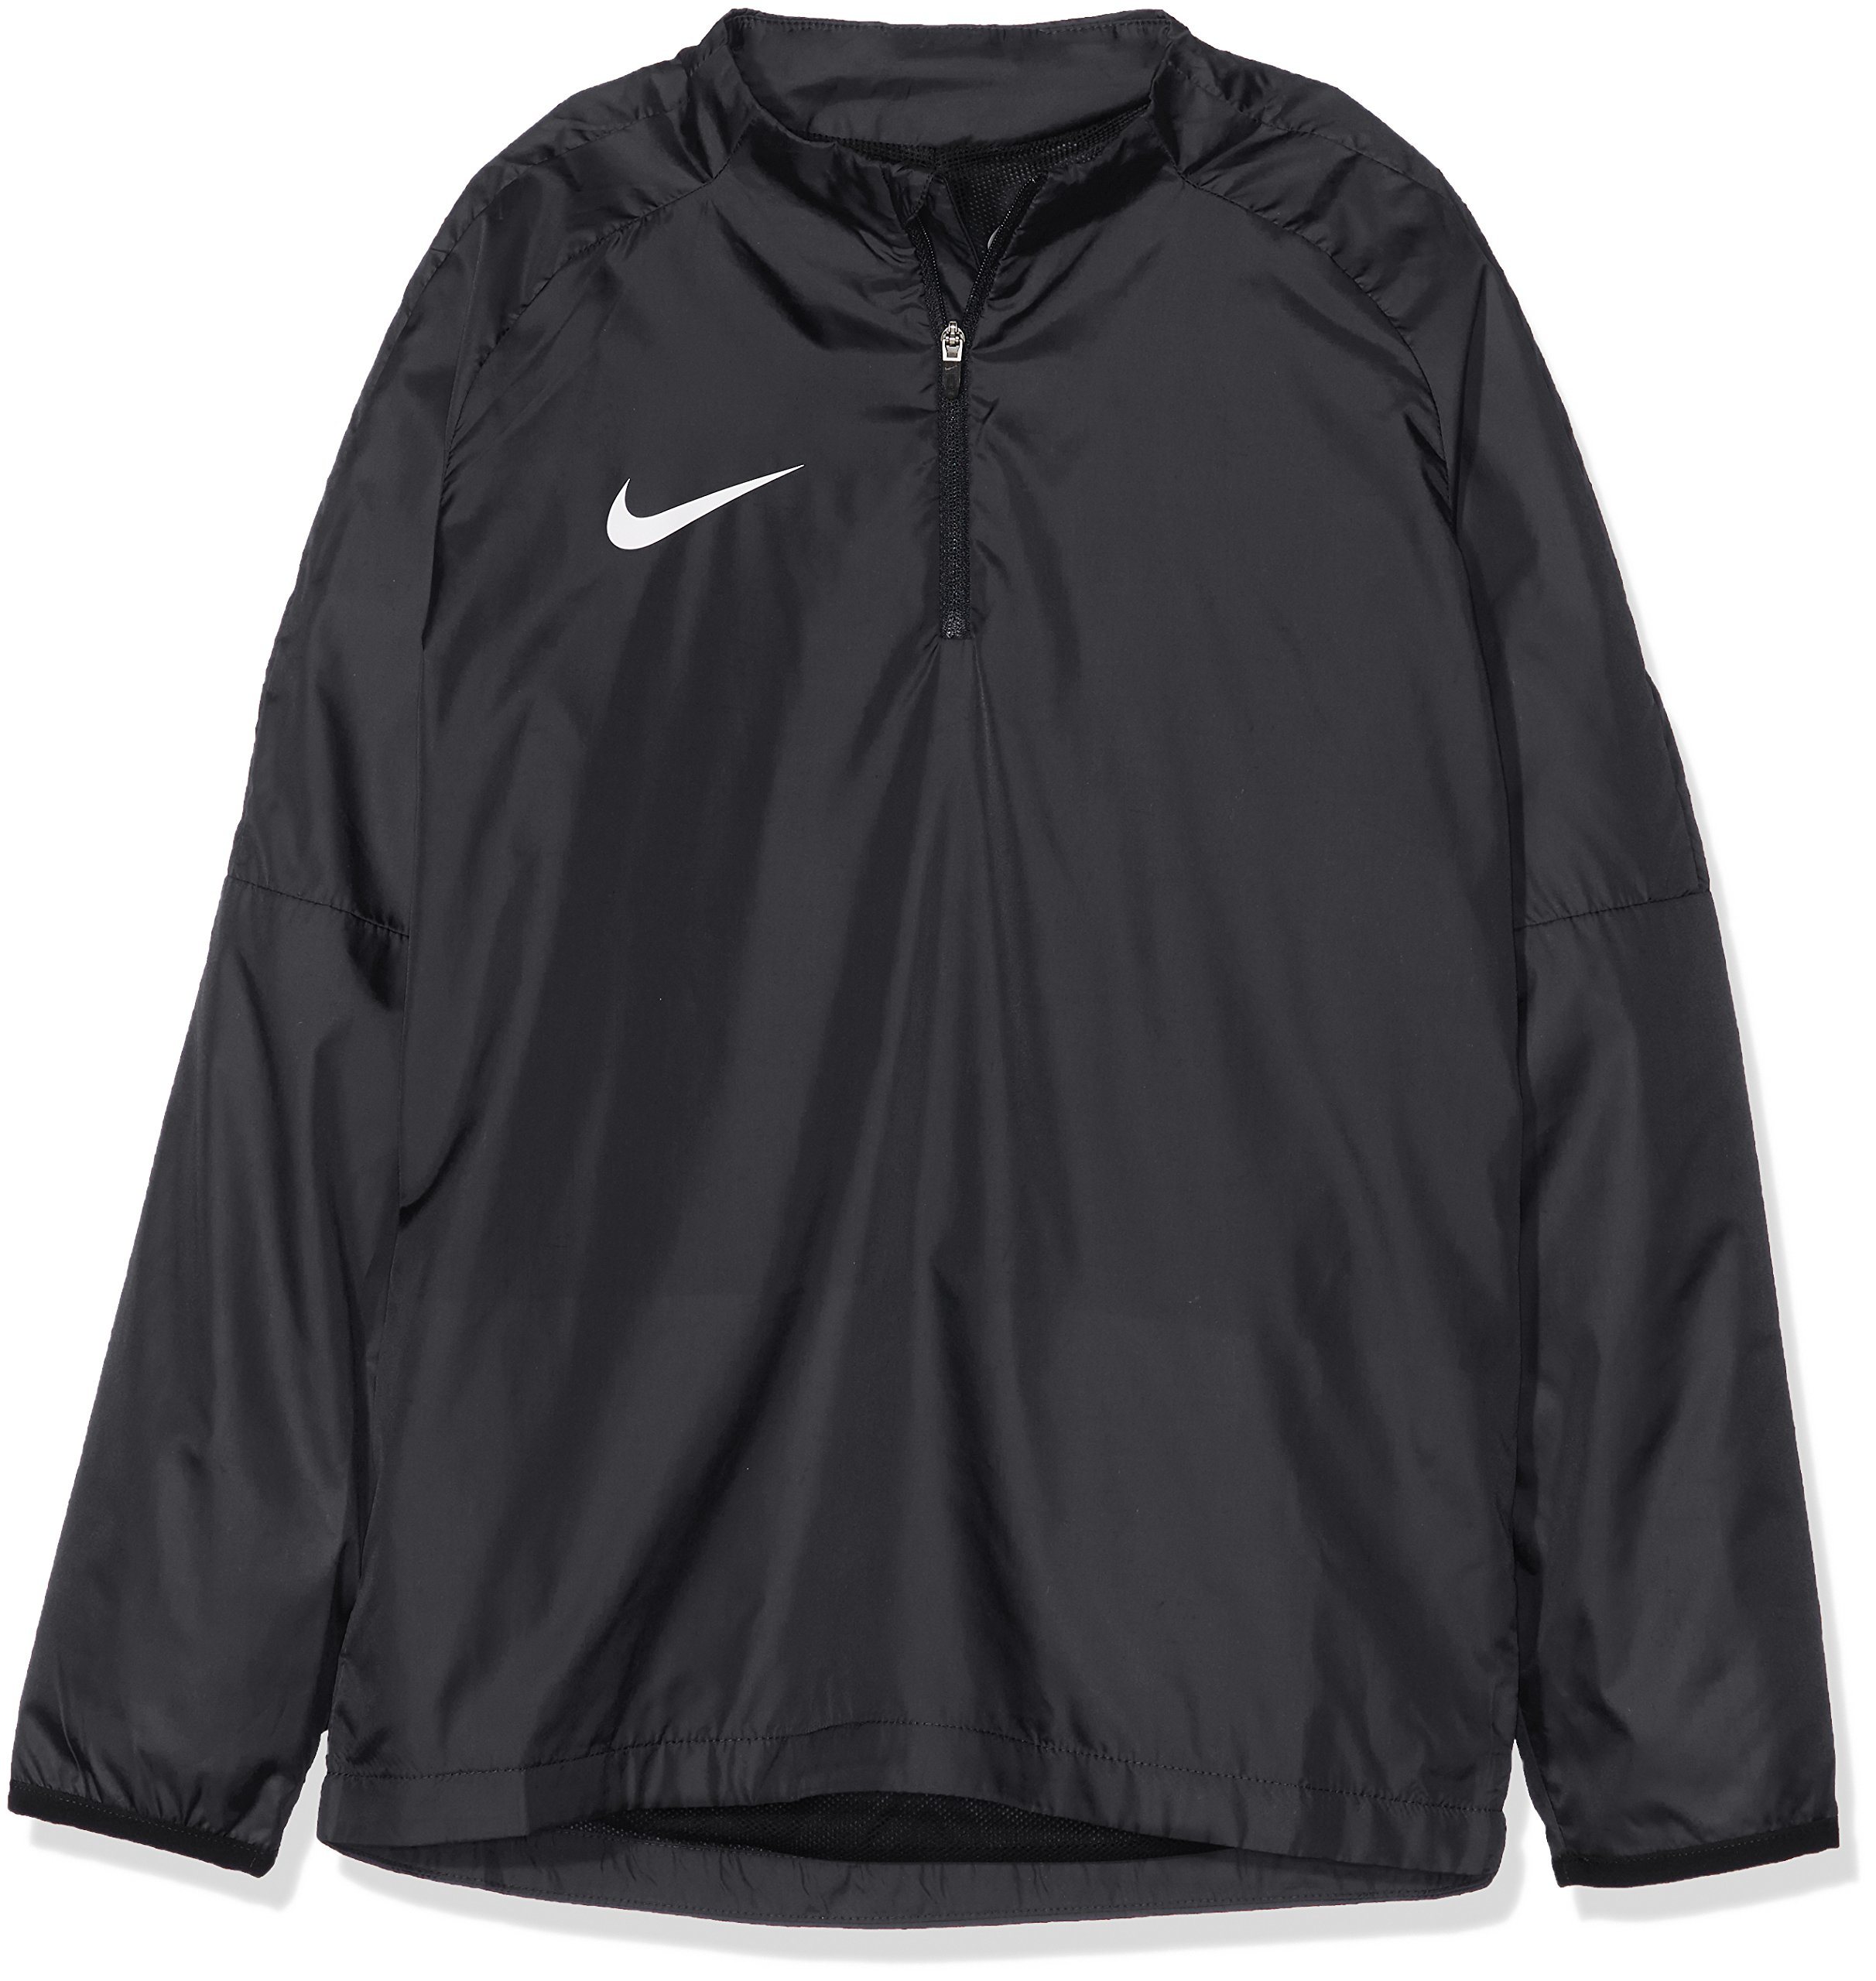 Nike Boys Academy 18 Shield Drill Top (Black, L)